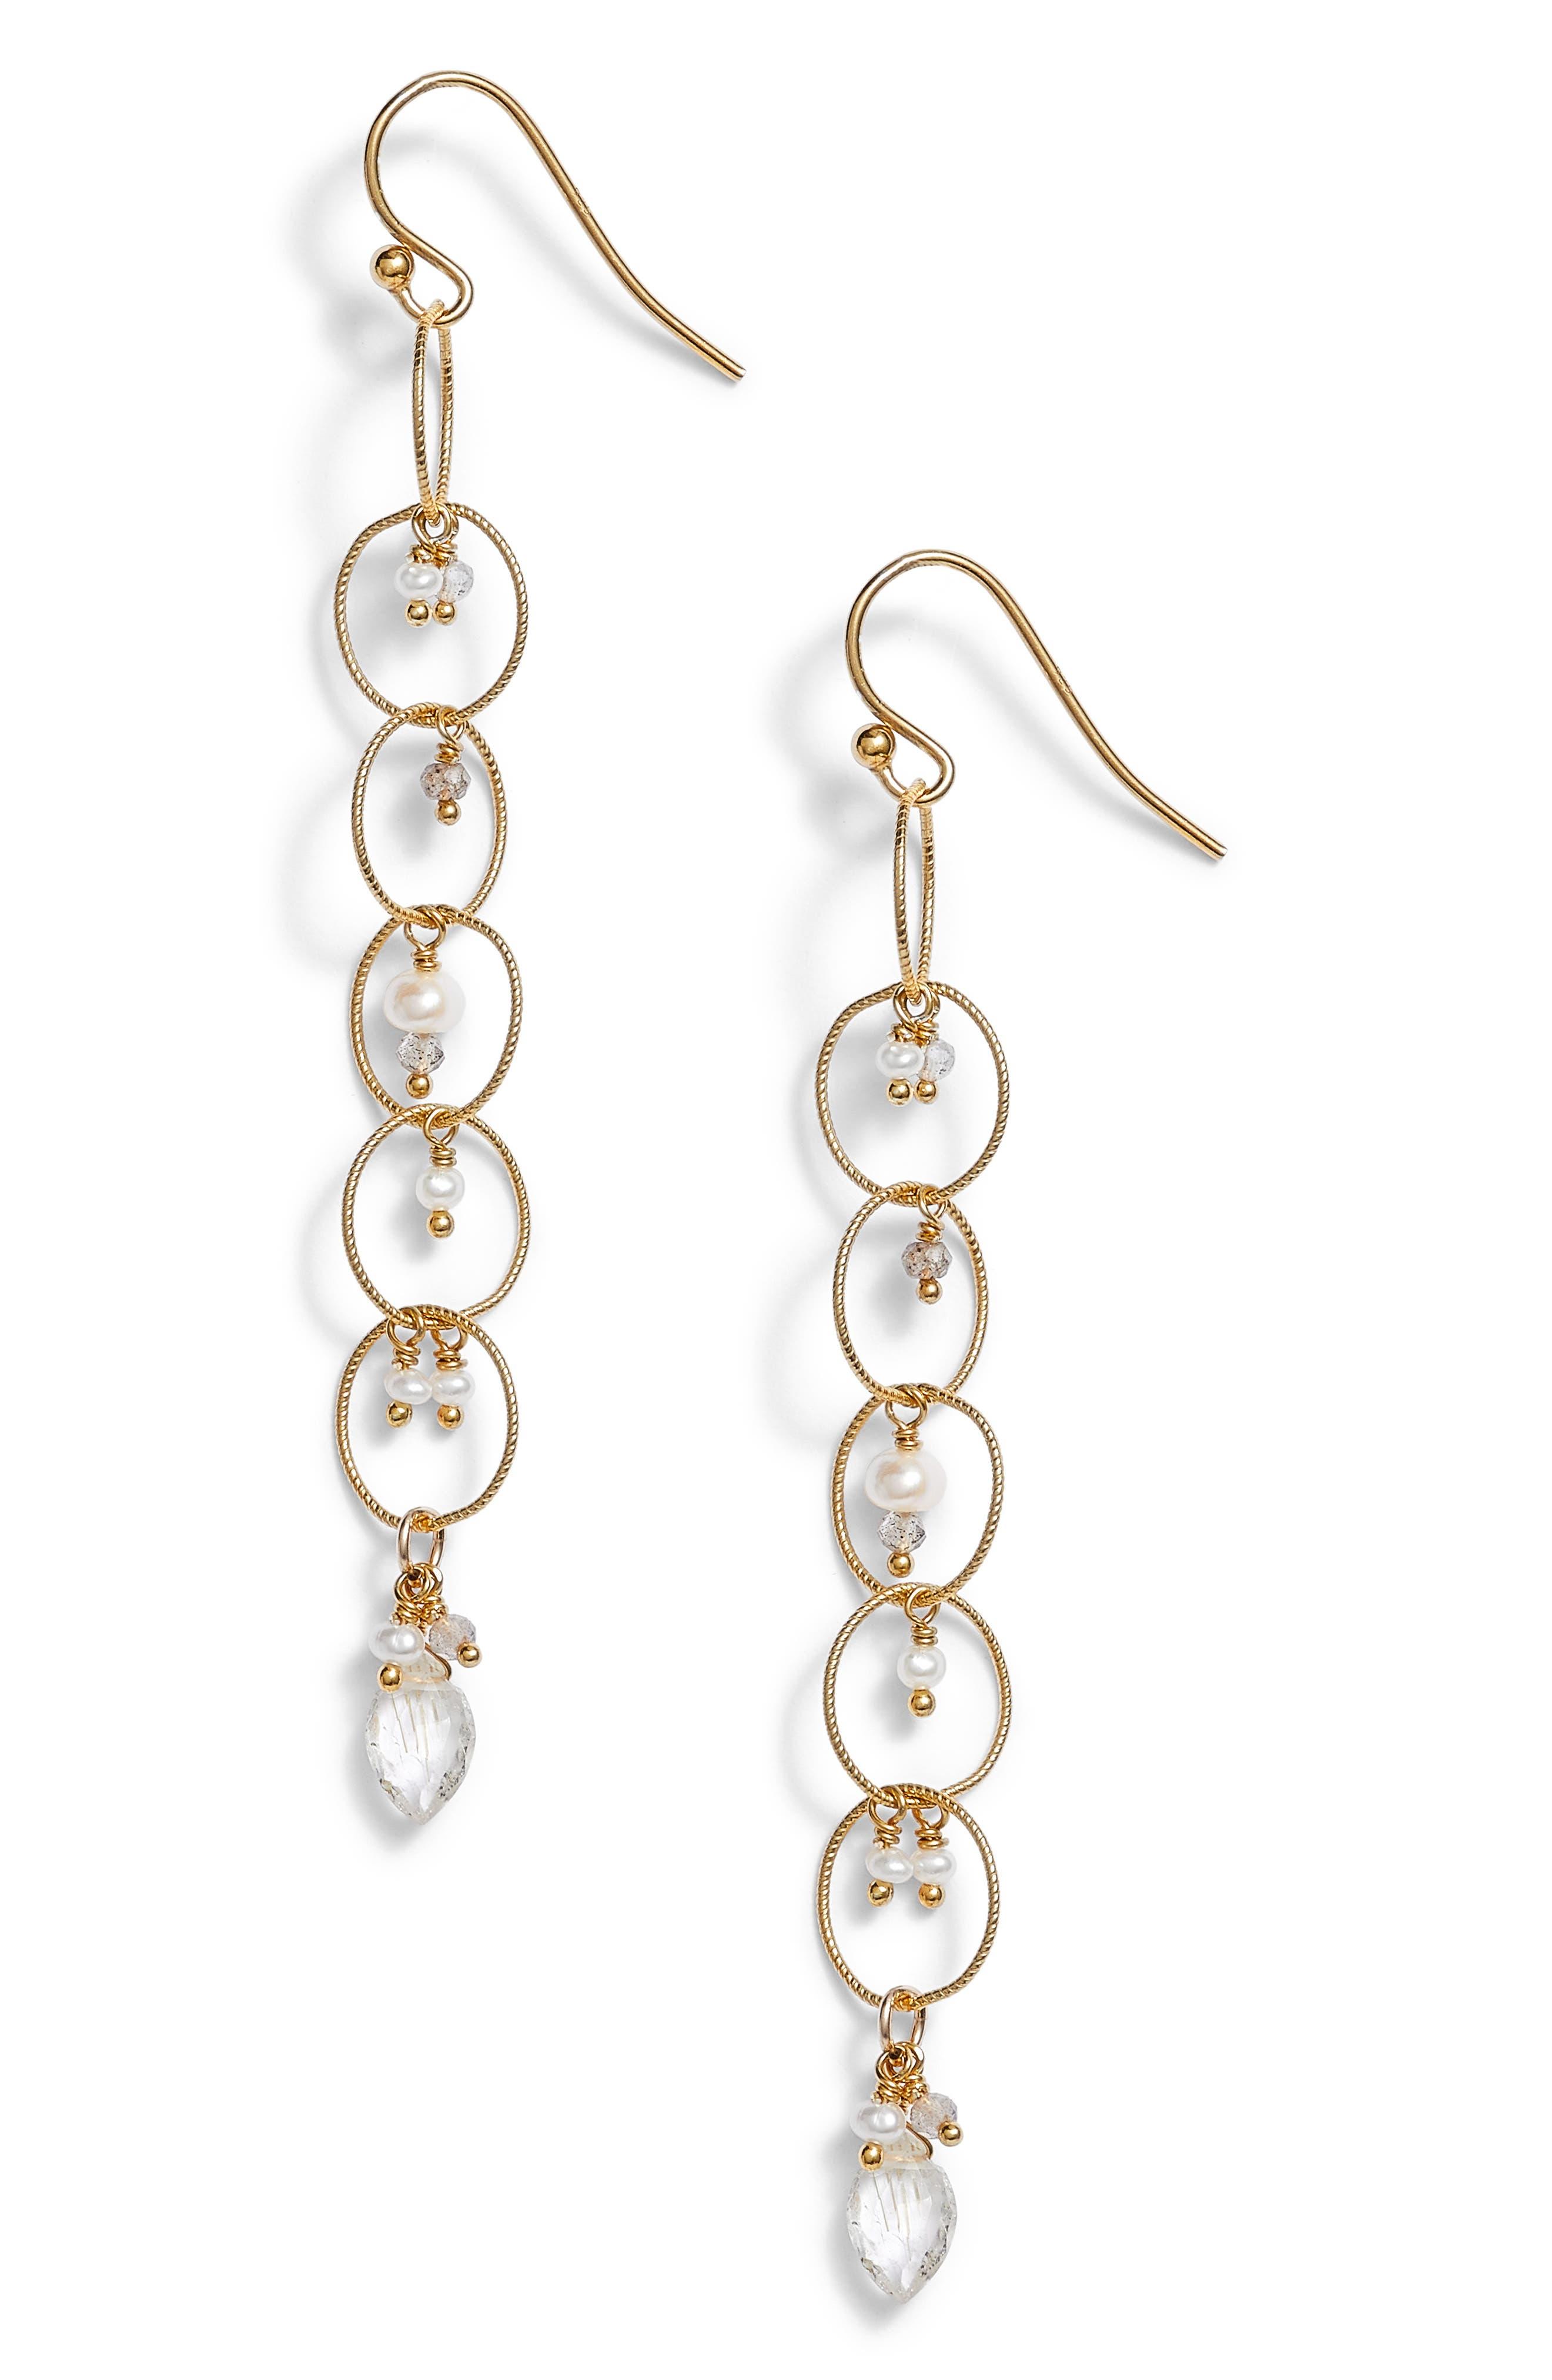 Chain Hoop Drop Earrings with Pearls,                         Main,                         color, 100